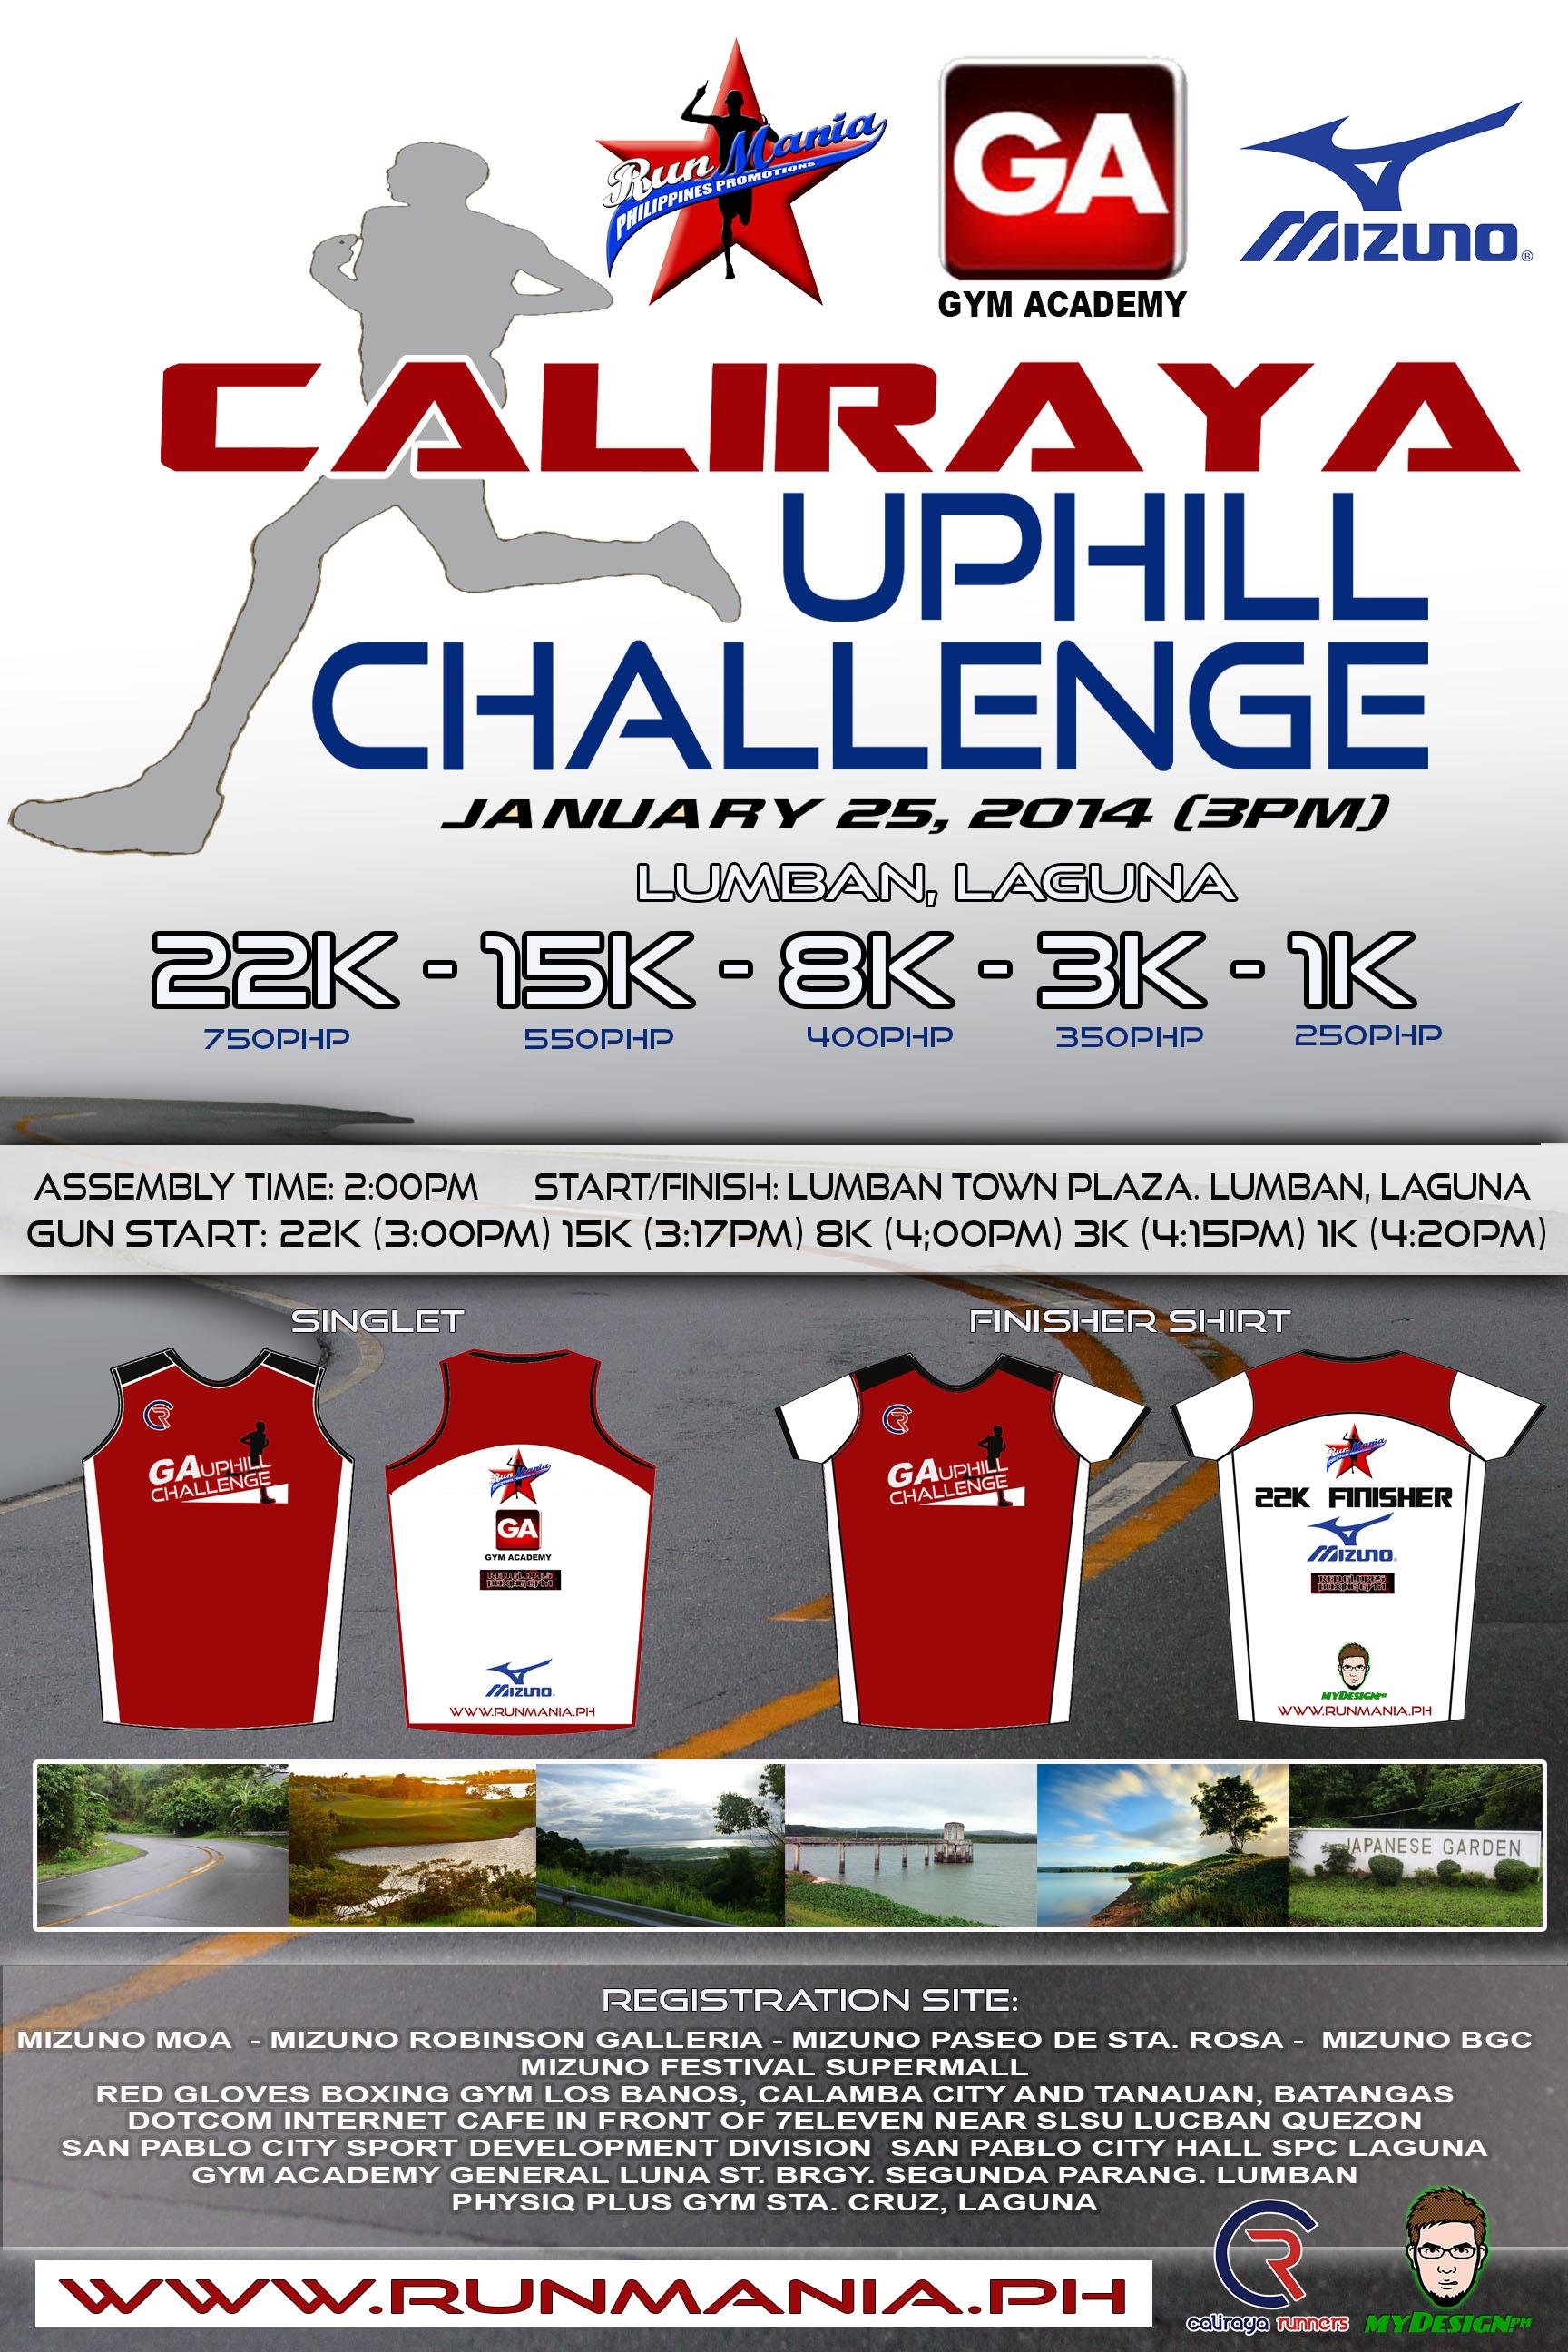 Gym-Academy-(GA)-Caliraya-Uphill-Challenge-poster